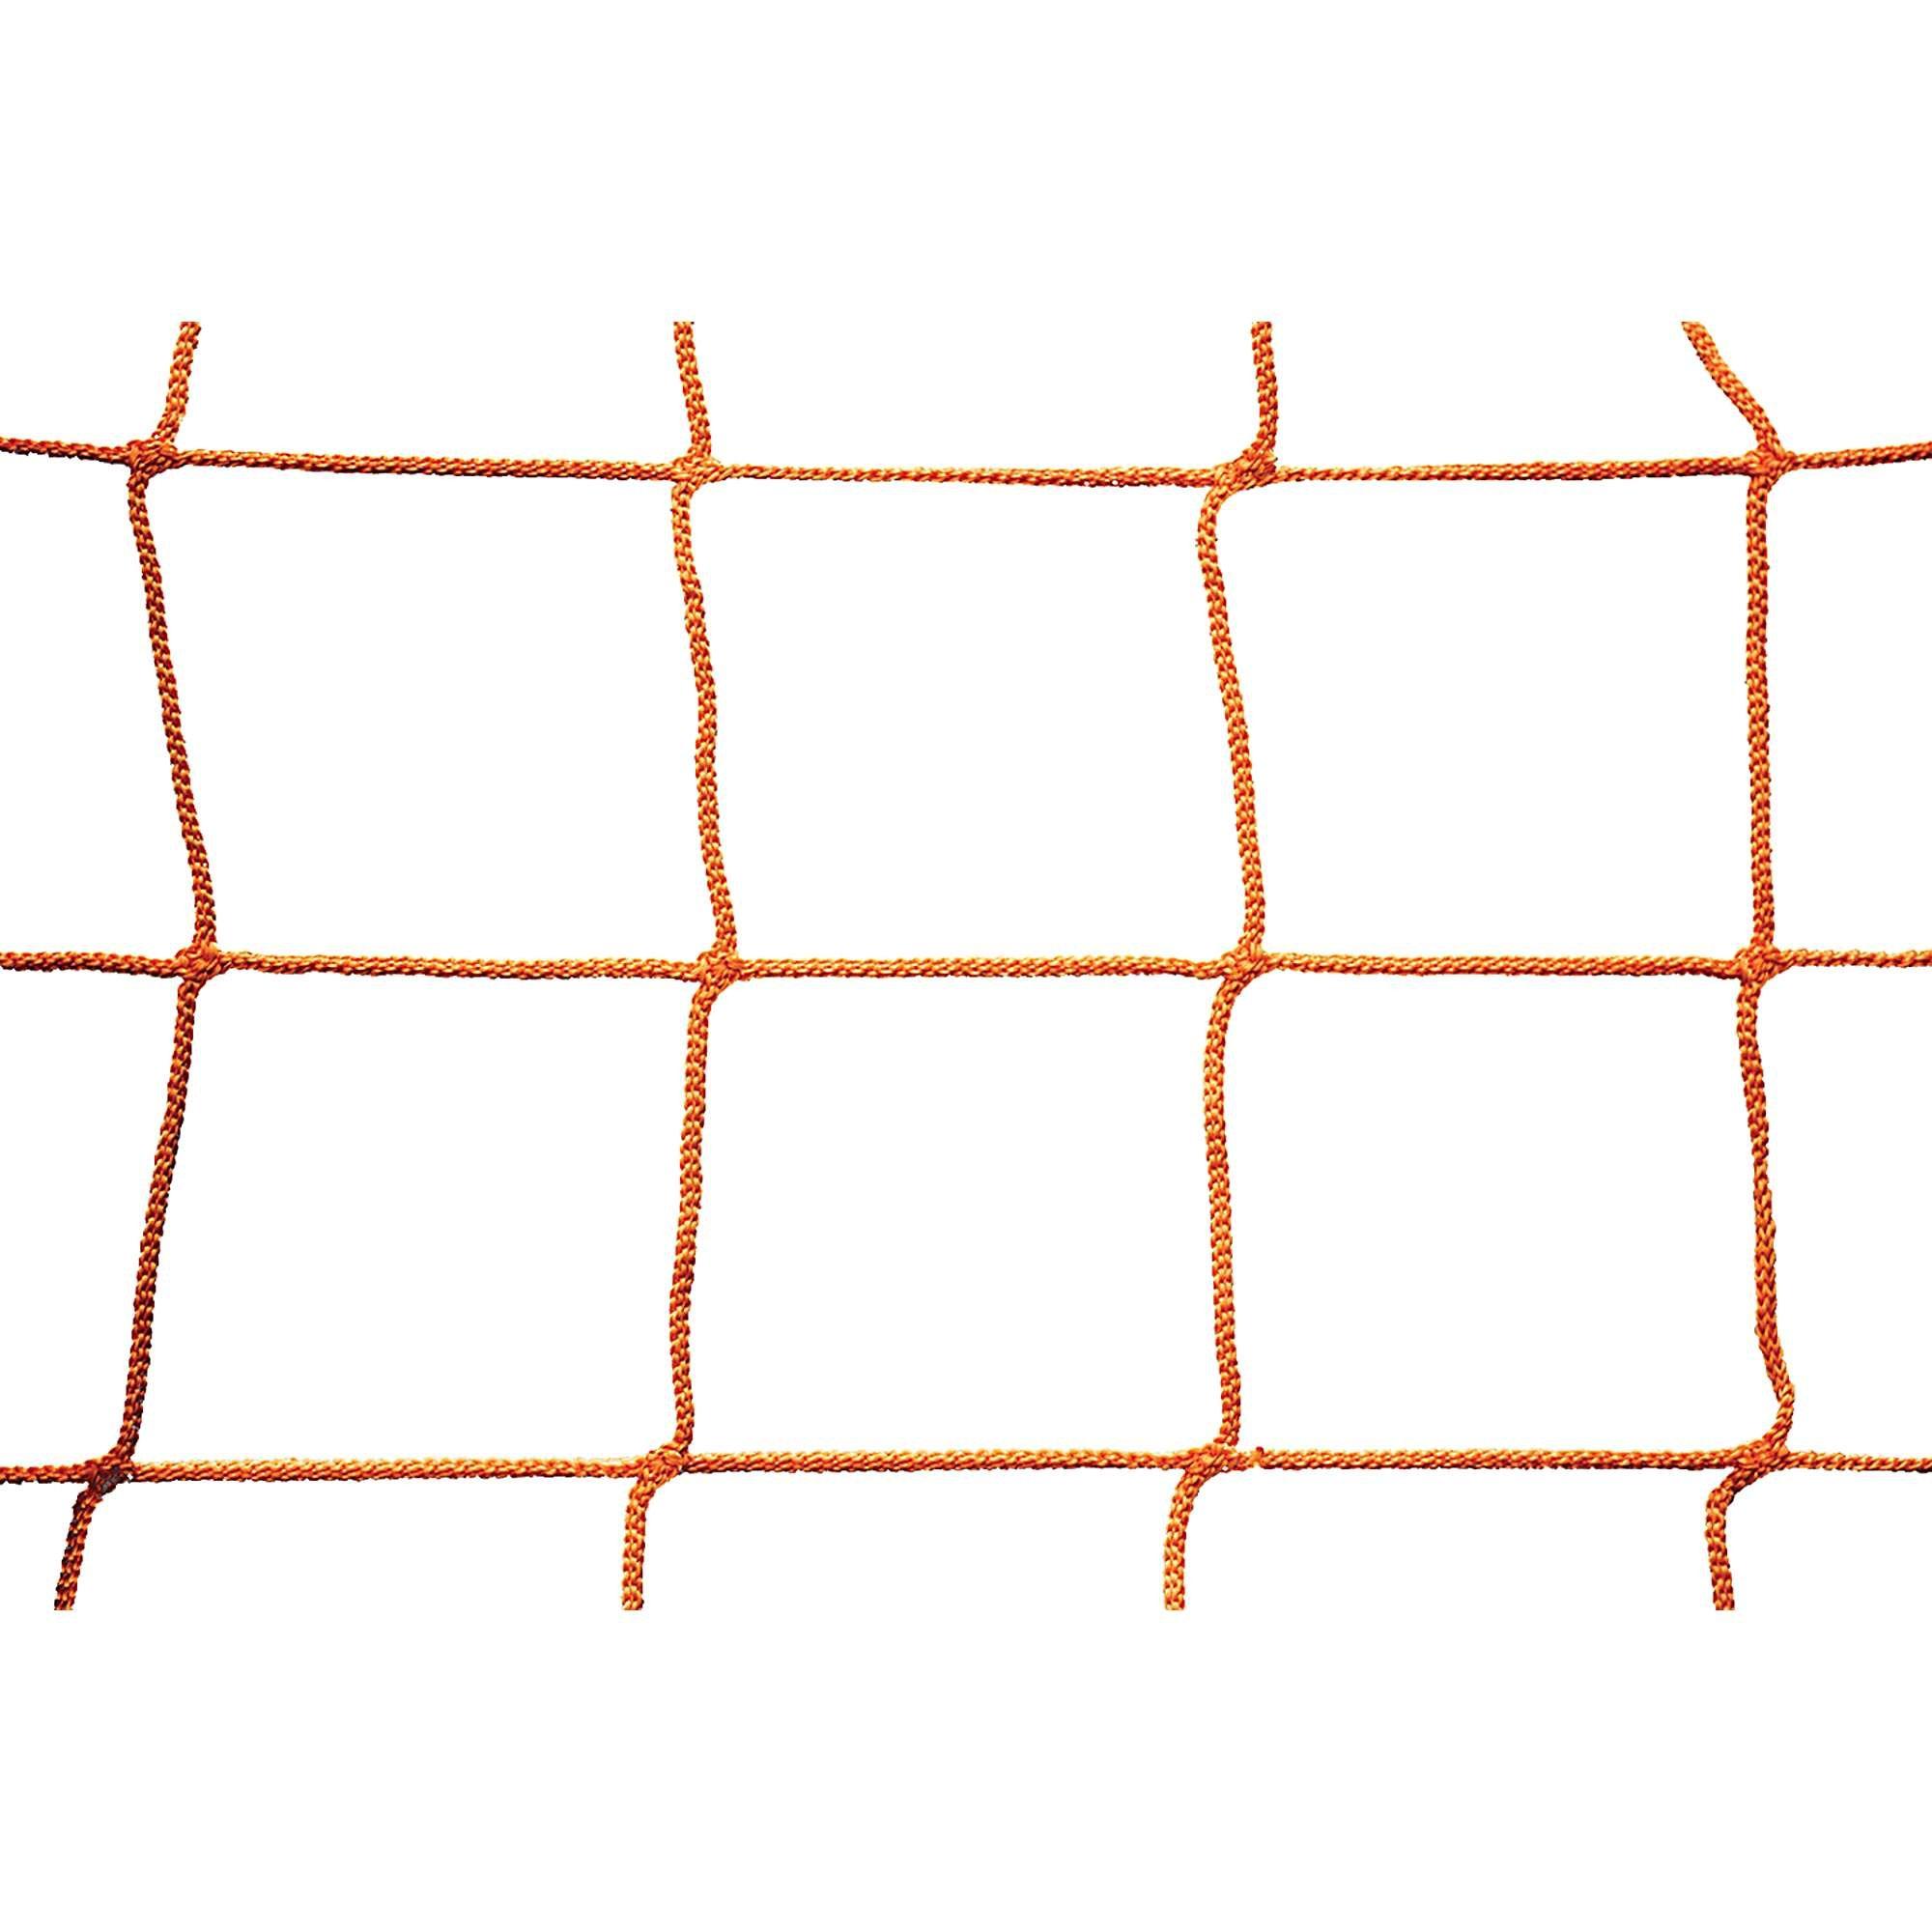 Kwik Goal Recreational Soccer Net - 7' x 21' x 0' x 7'